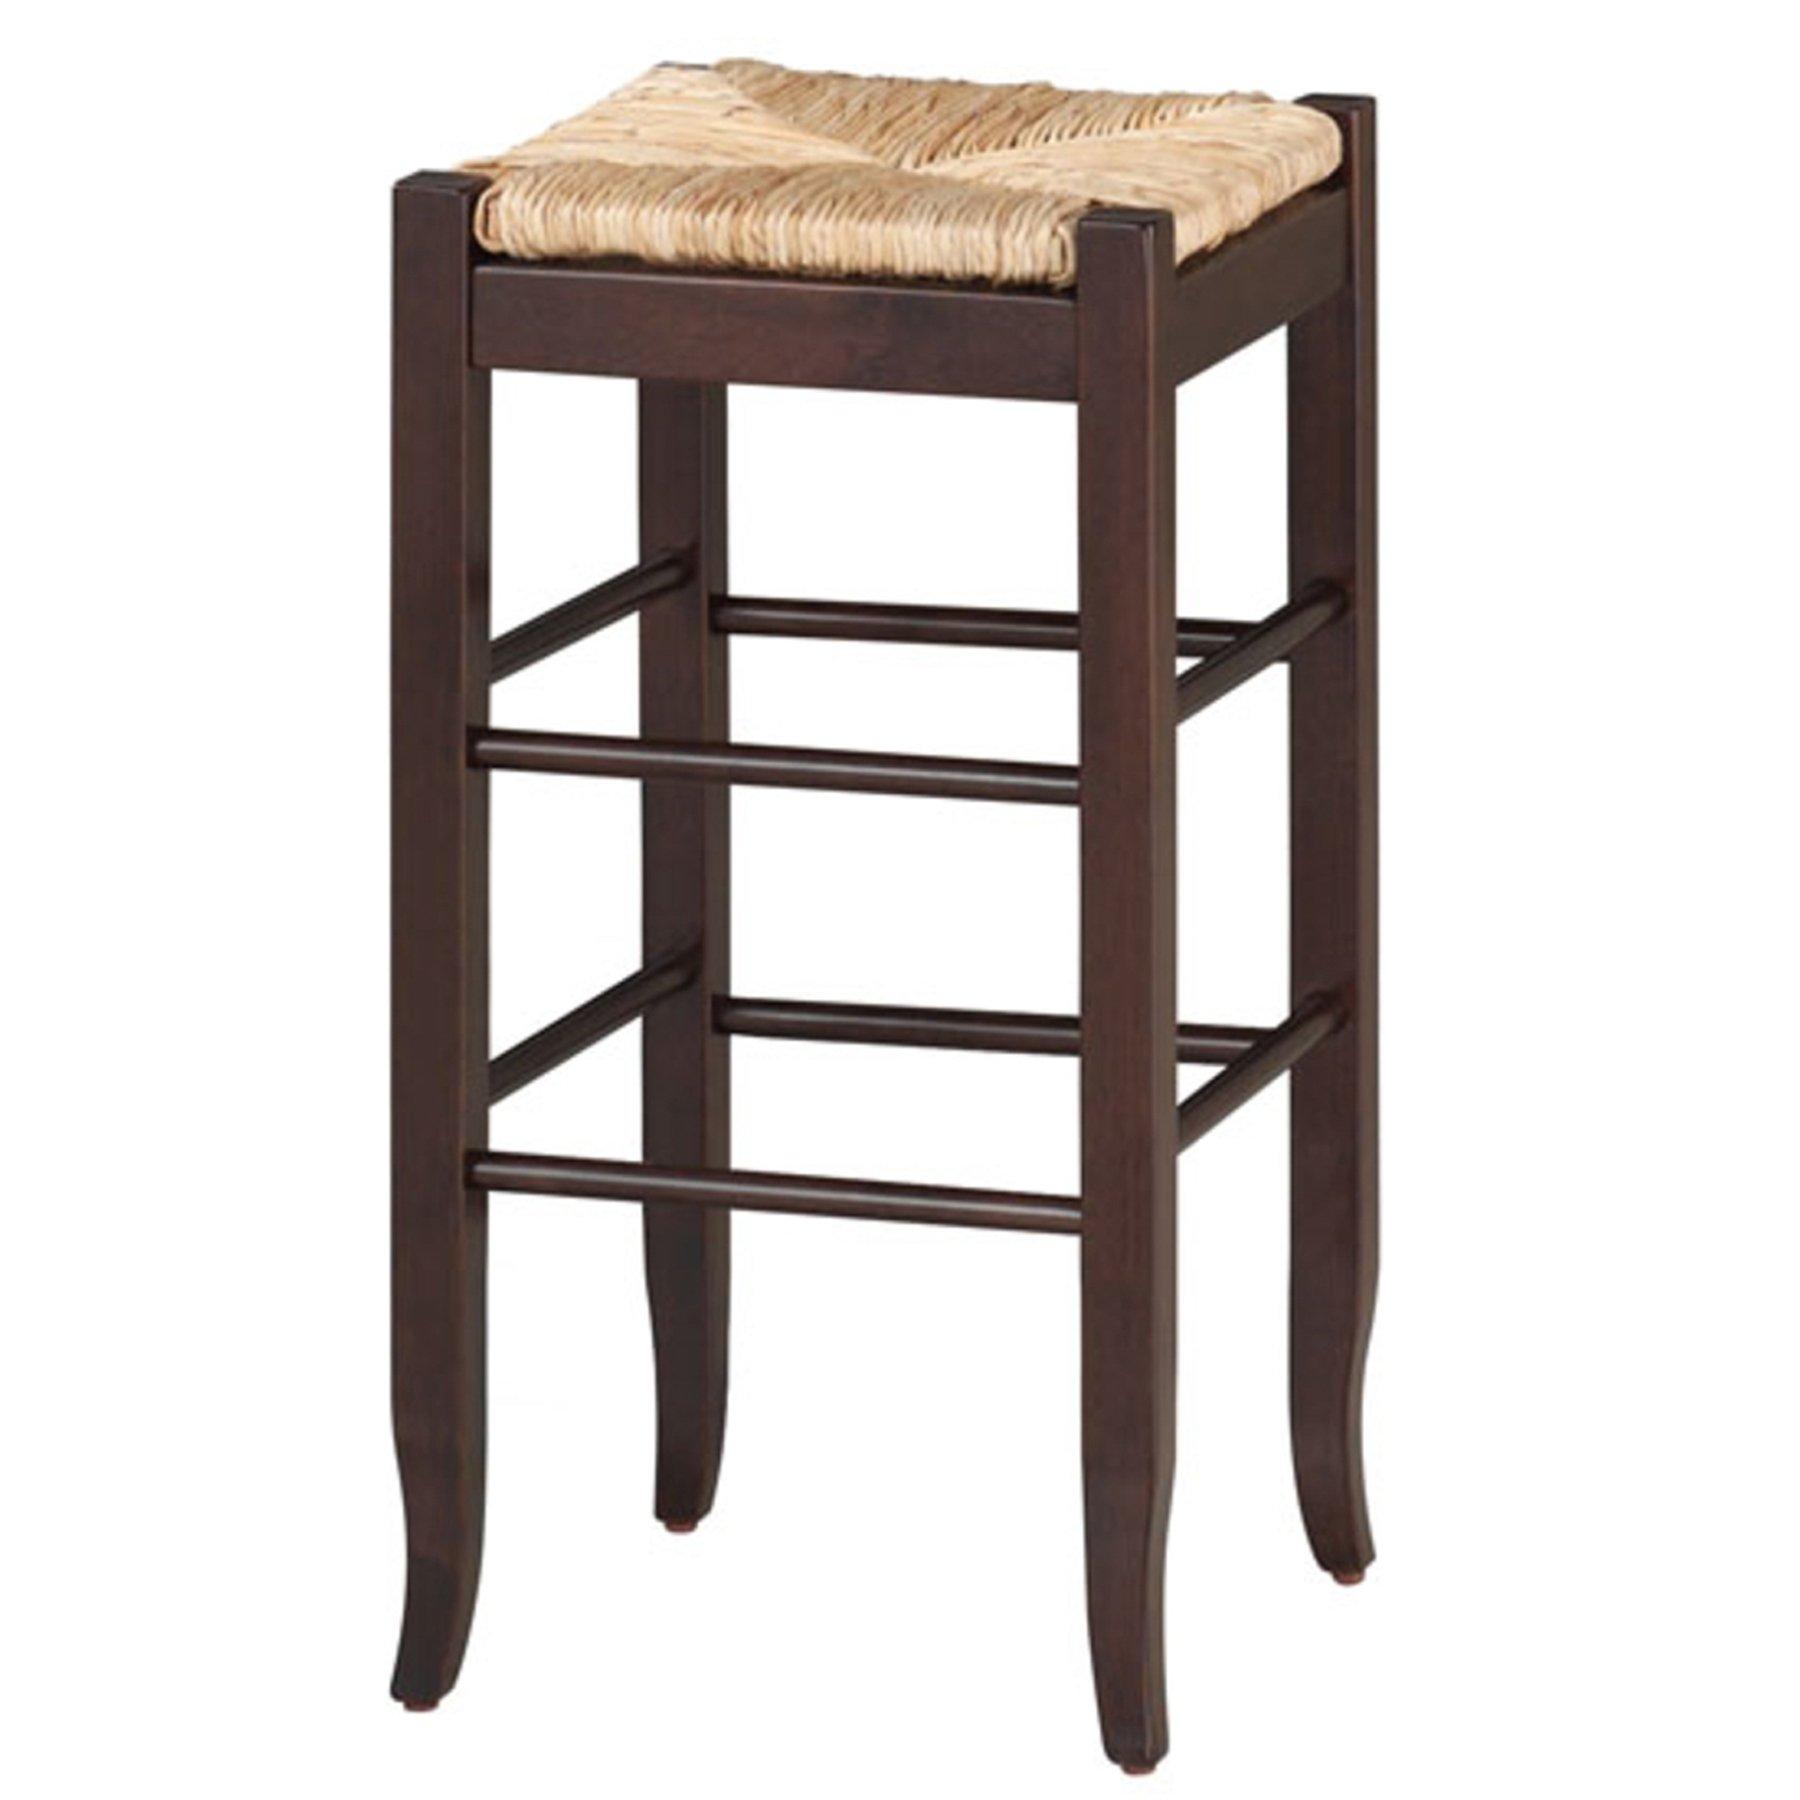 Boraam 94829 Square Rush Seat Bar Height Stool, 29-Inch, Cappuccino